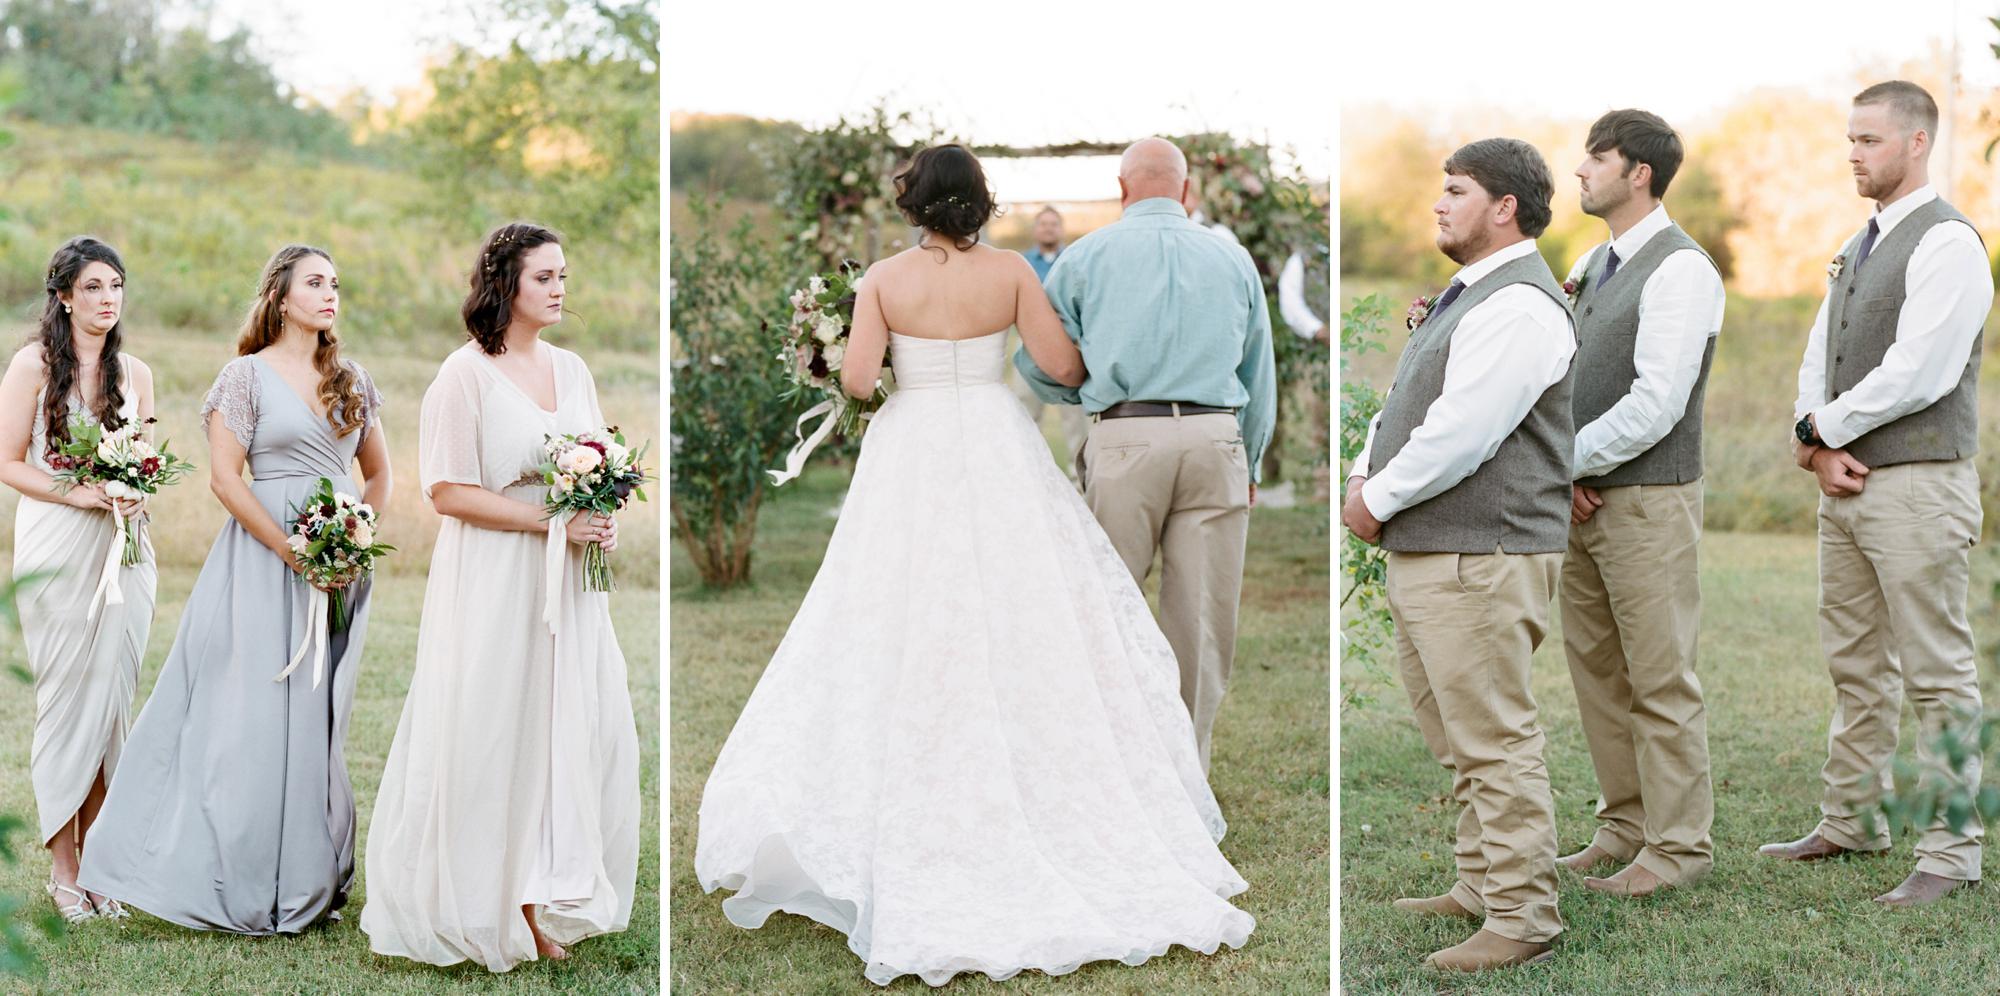 southern-weddings-film-photographer_0037.jpg